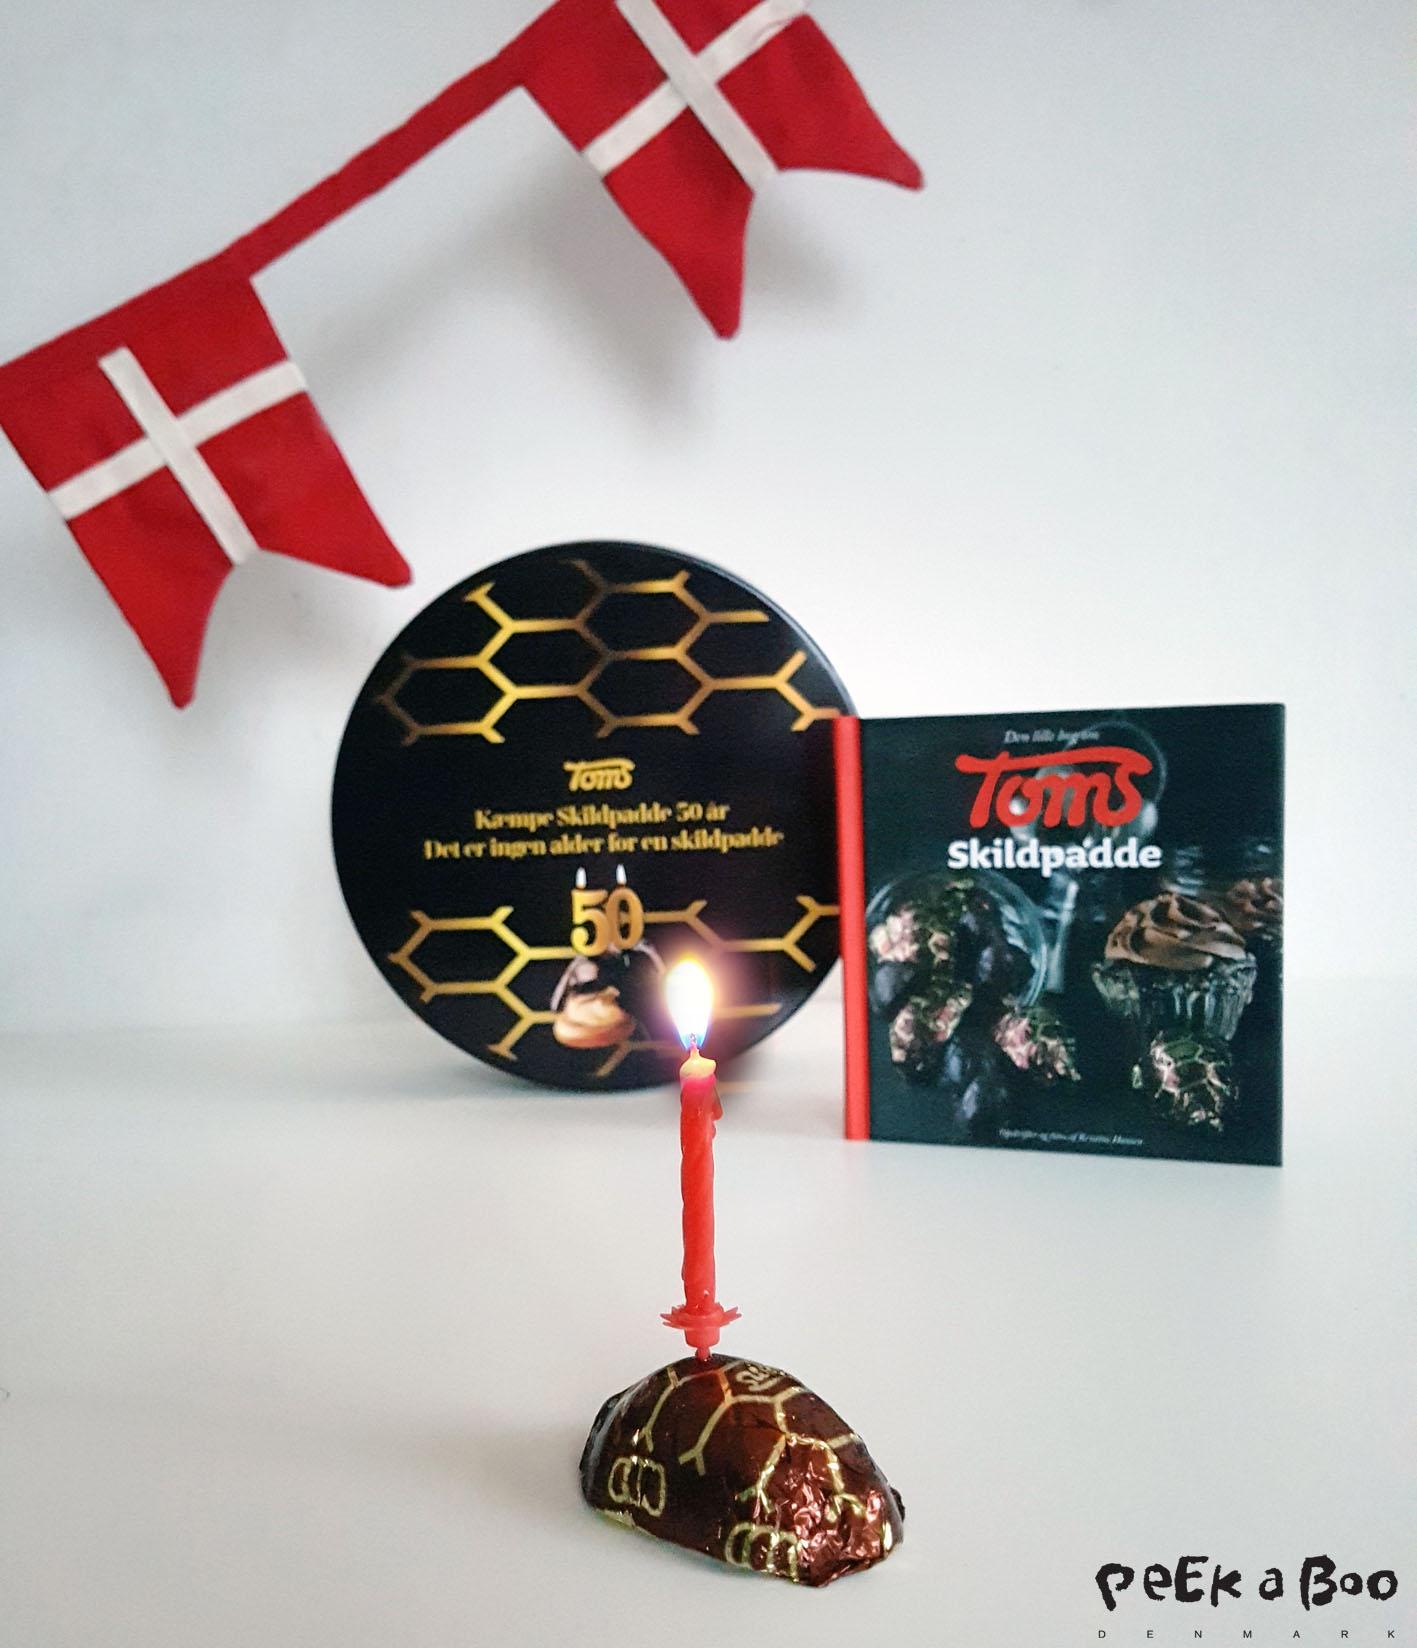 "Prøv også ""hyggehjulet"" i Tivoli måske kan du også her vinde gode chokolade præmier fra Tom's Chokolade."